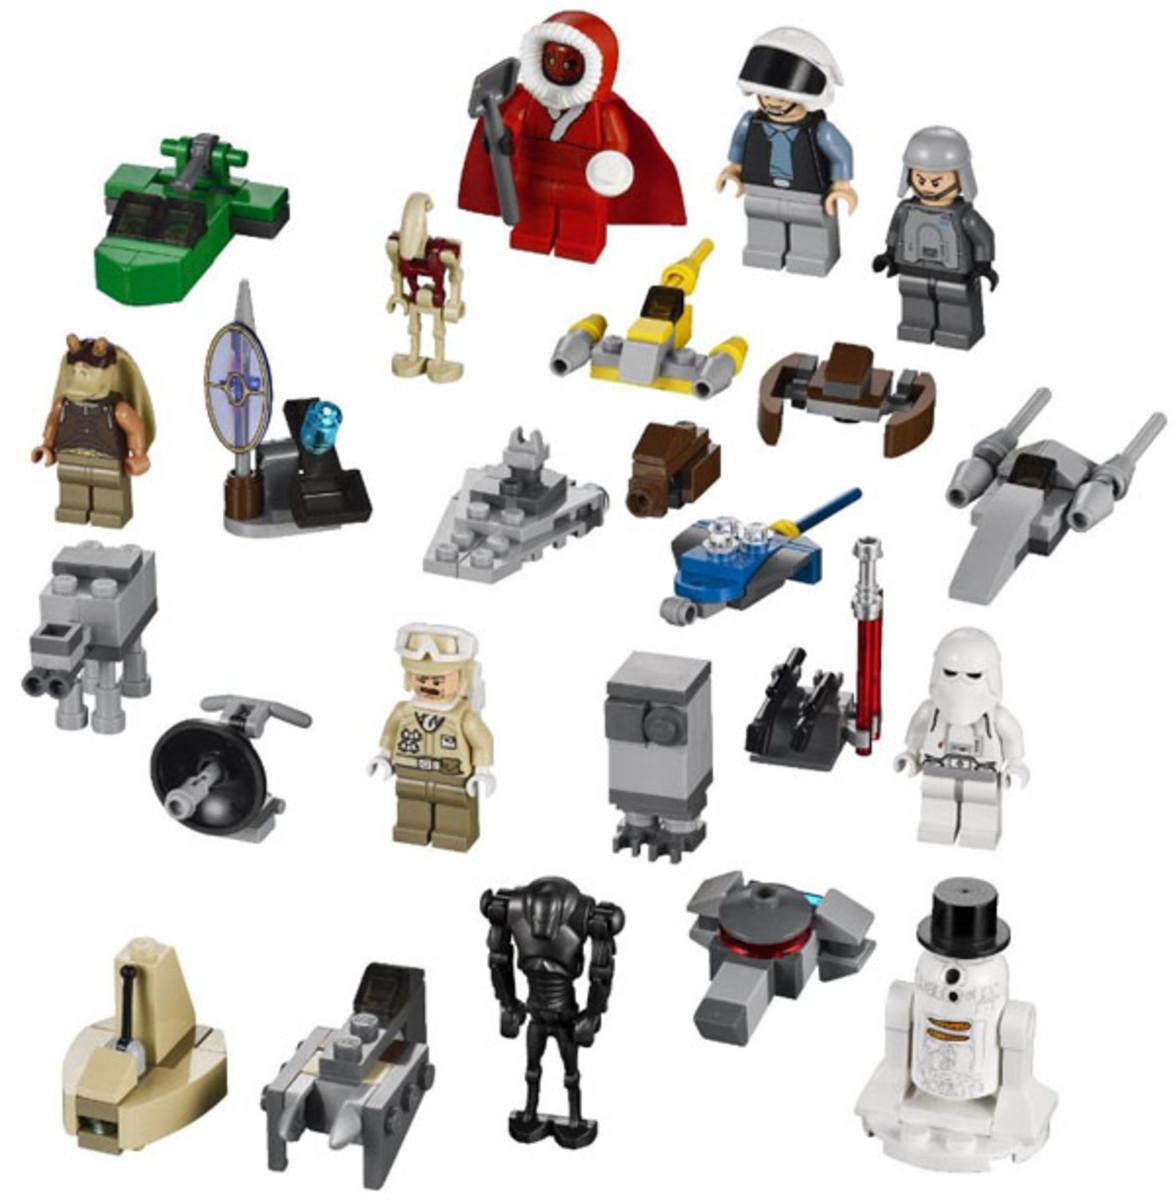 LEGO Star Wars Advent Calendar 9509 Sets